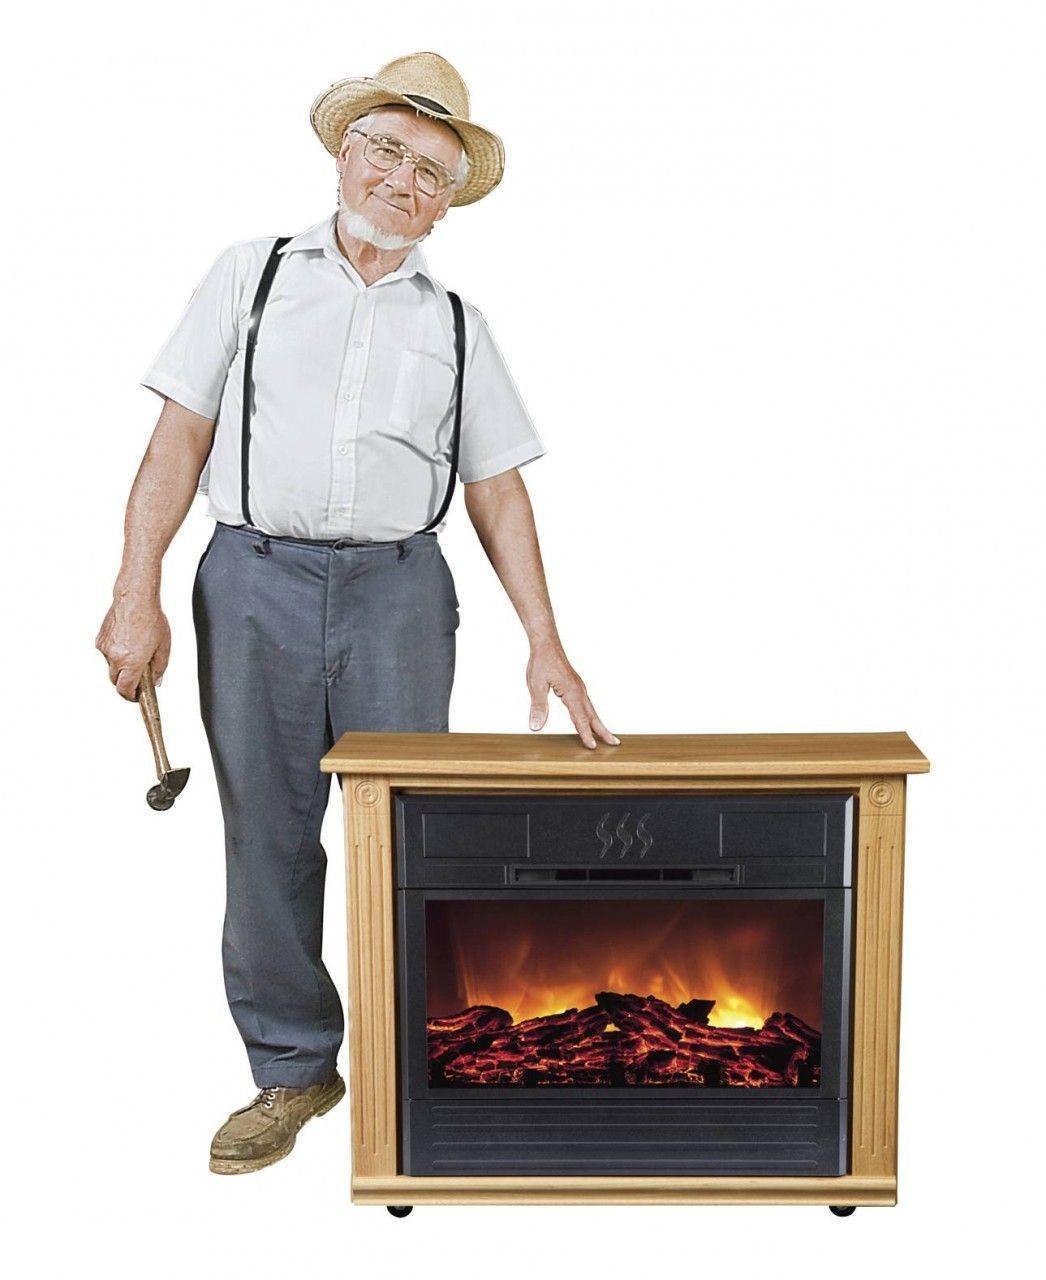 Amish Yard Heatsurge Roll N Glow Fireplace Ev 2 355 00 Http